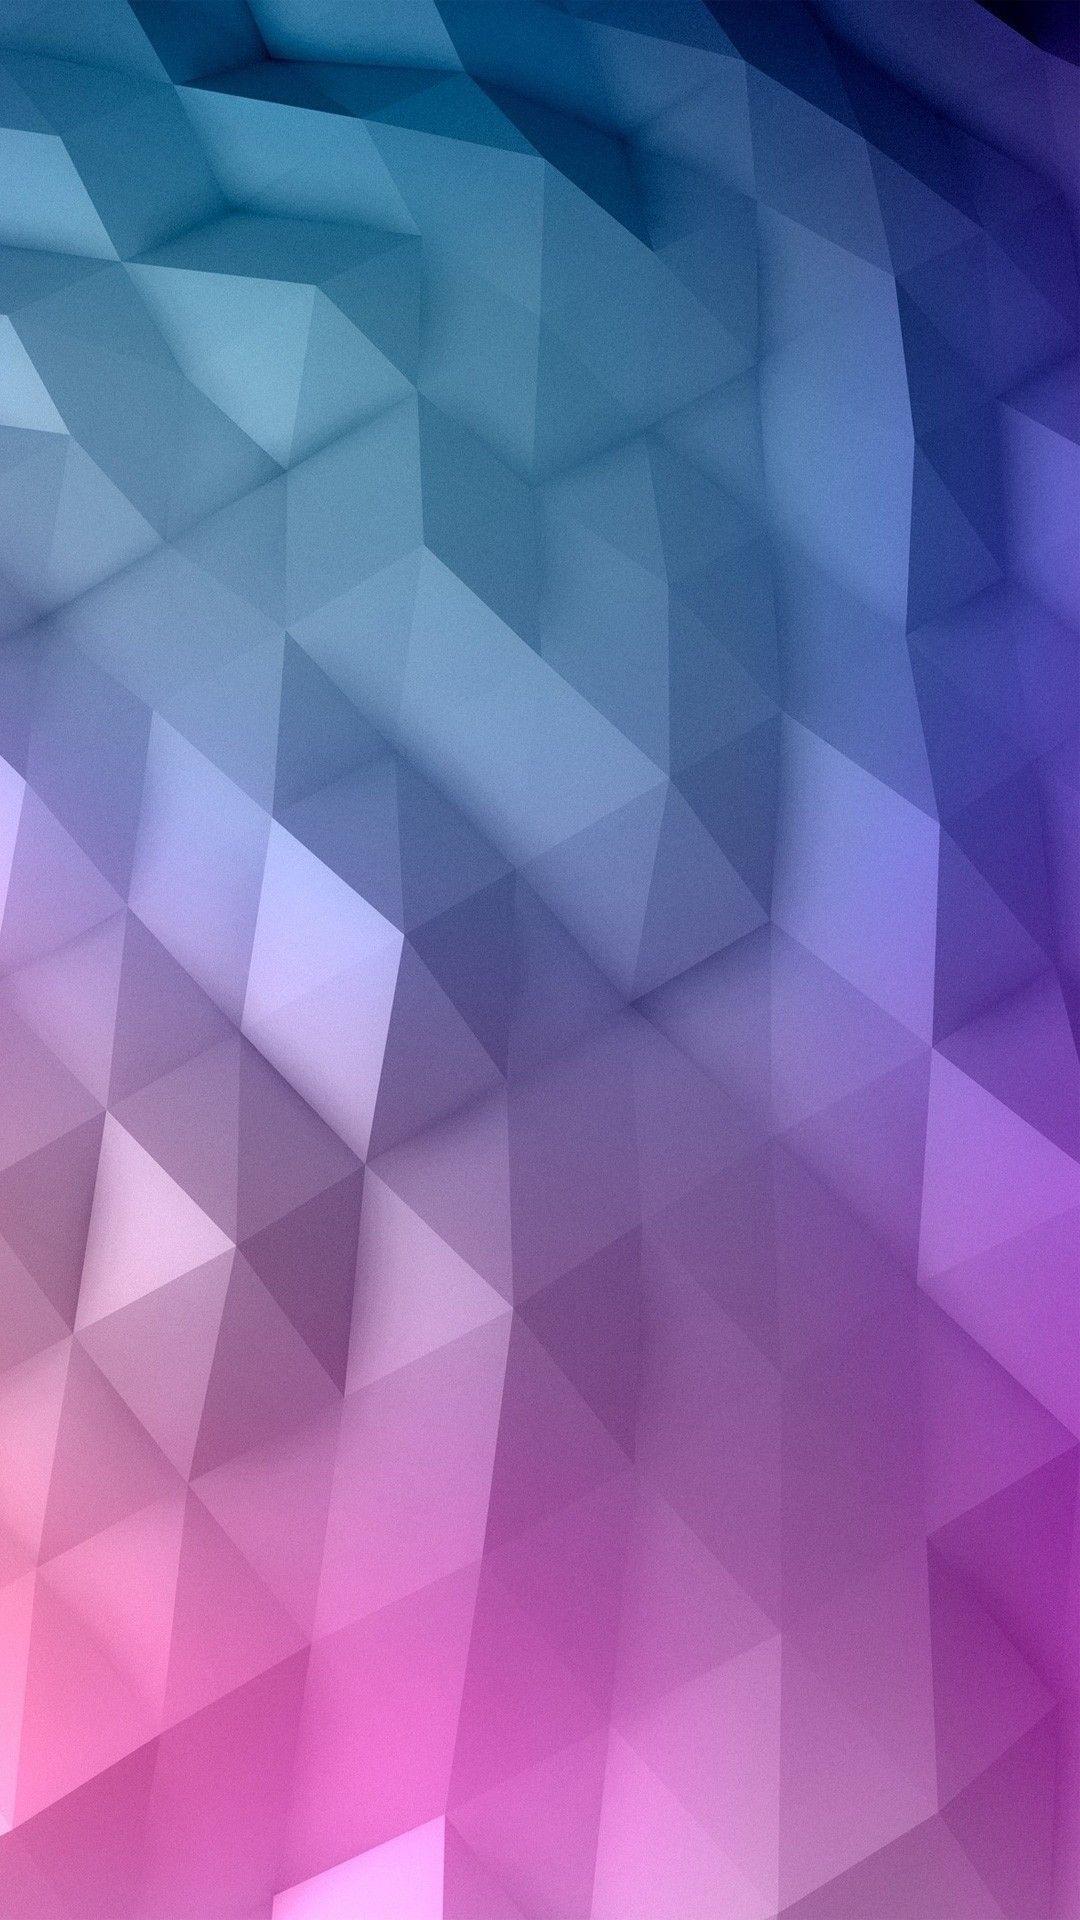 Gradient Geometry iPhone 7 wallpaper iPhone 8